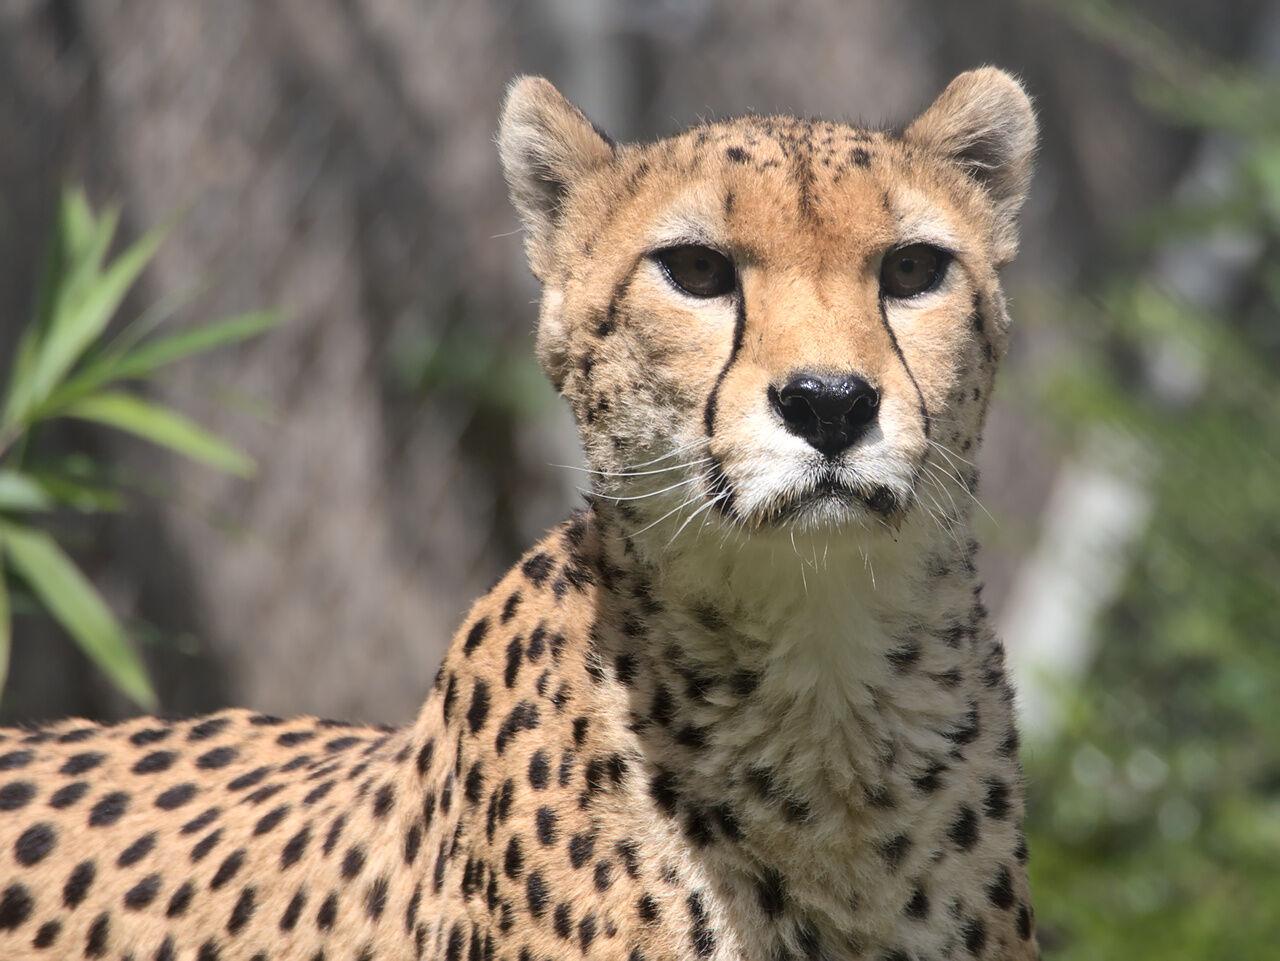 20200524_Zoo_Landau_035